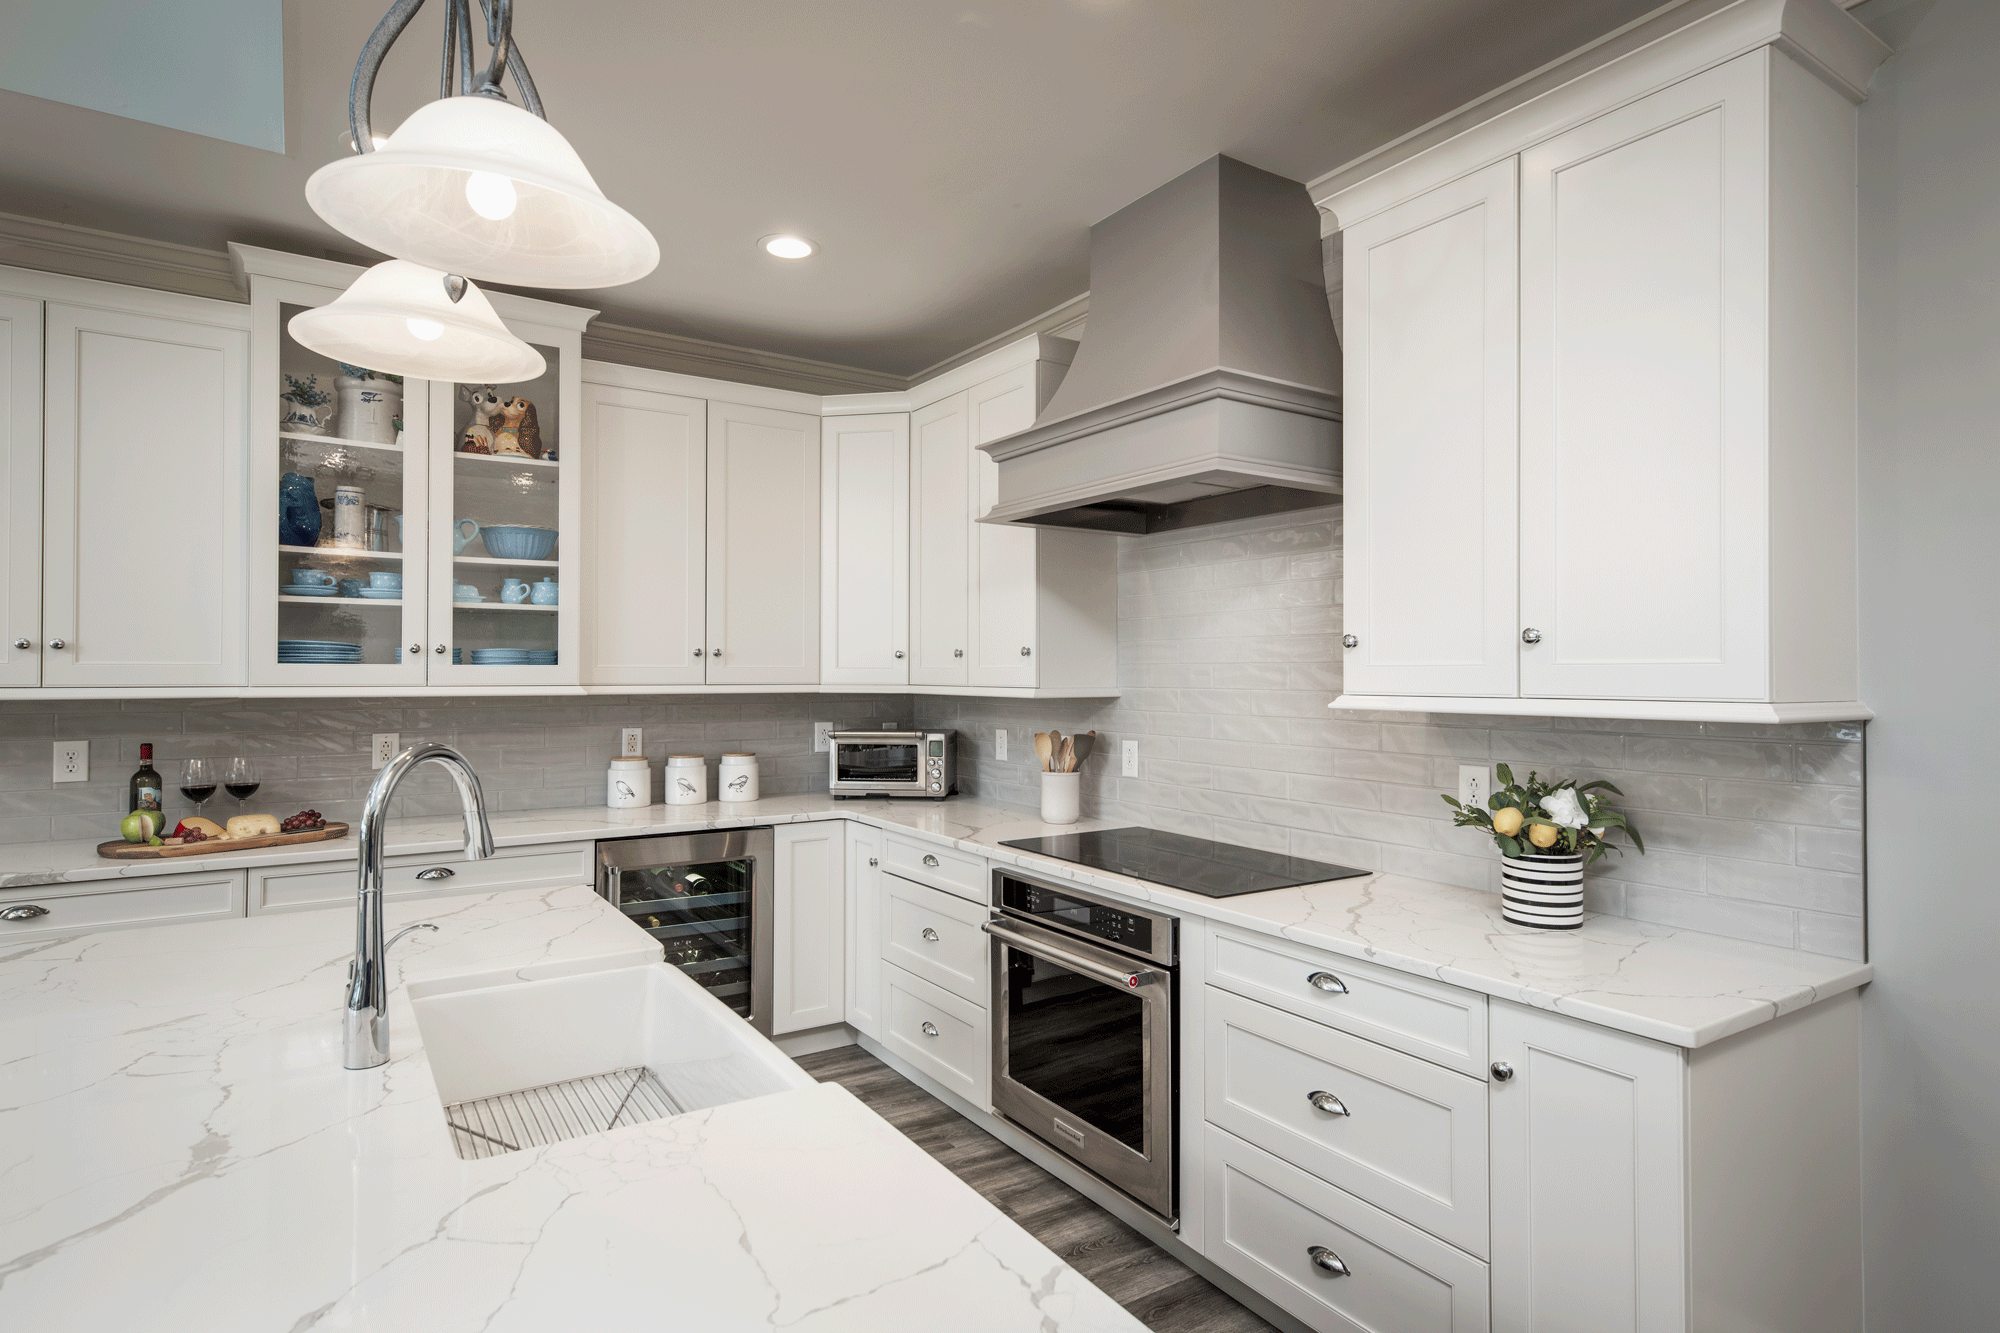 sleek kitchen remodel with flooring, cabinets, pendant lighting, recessed lighting, tile backsplash, island, seating